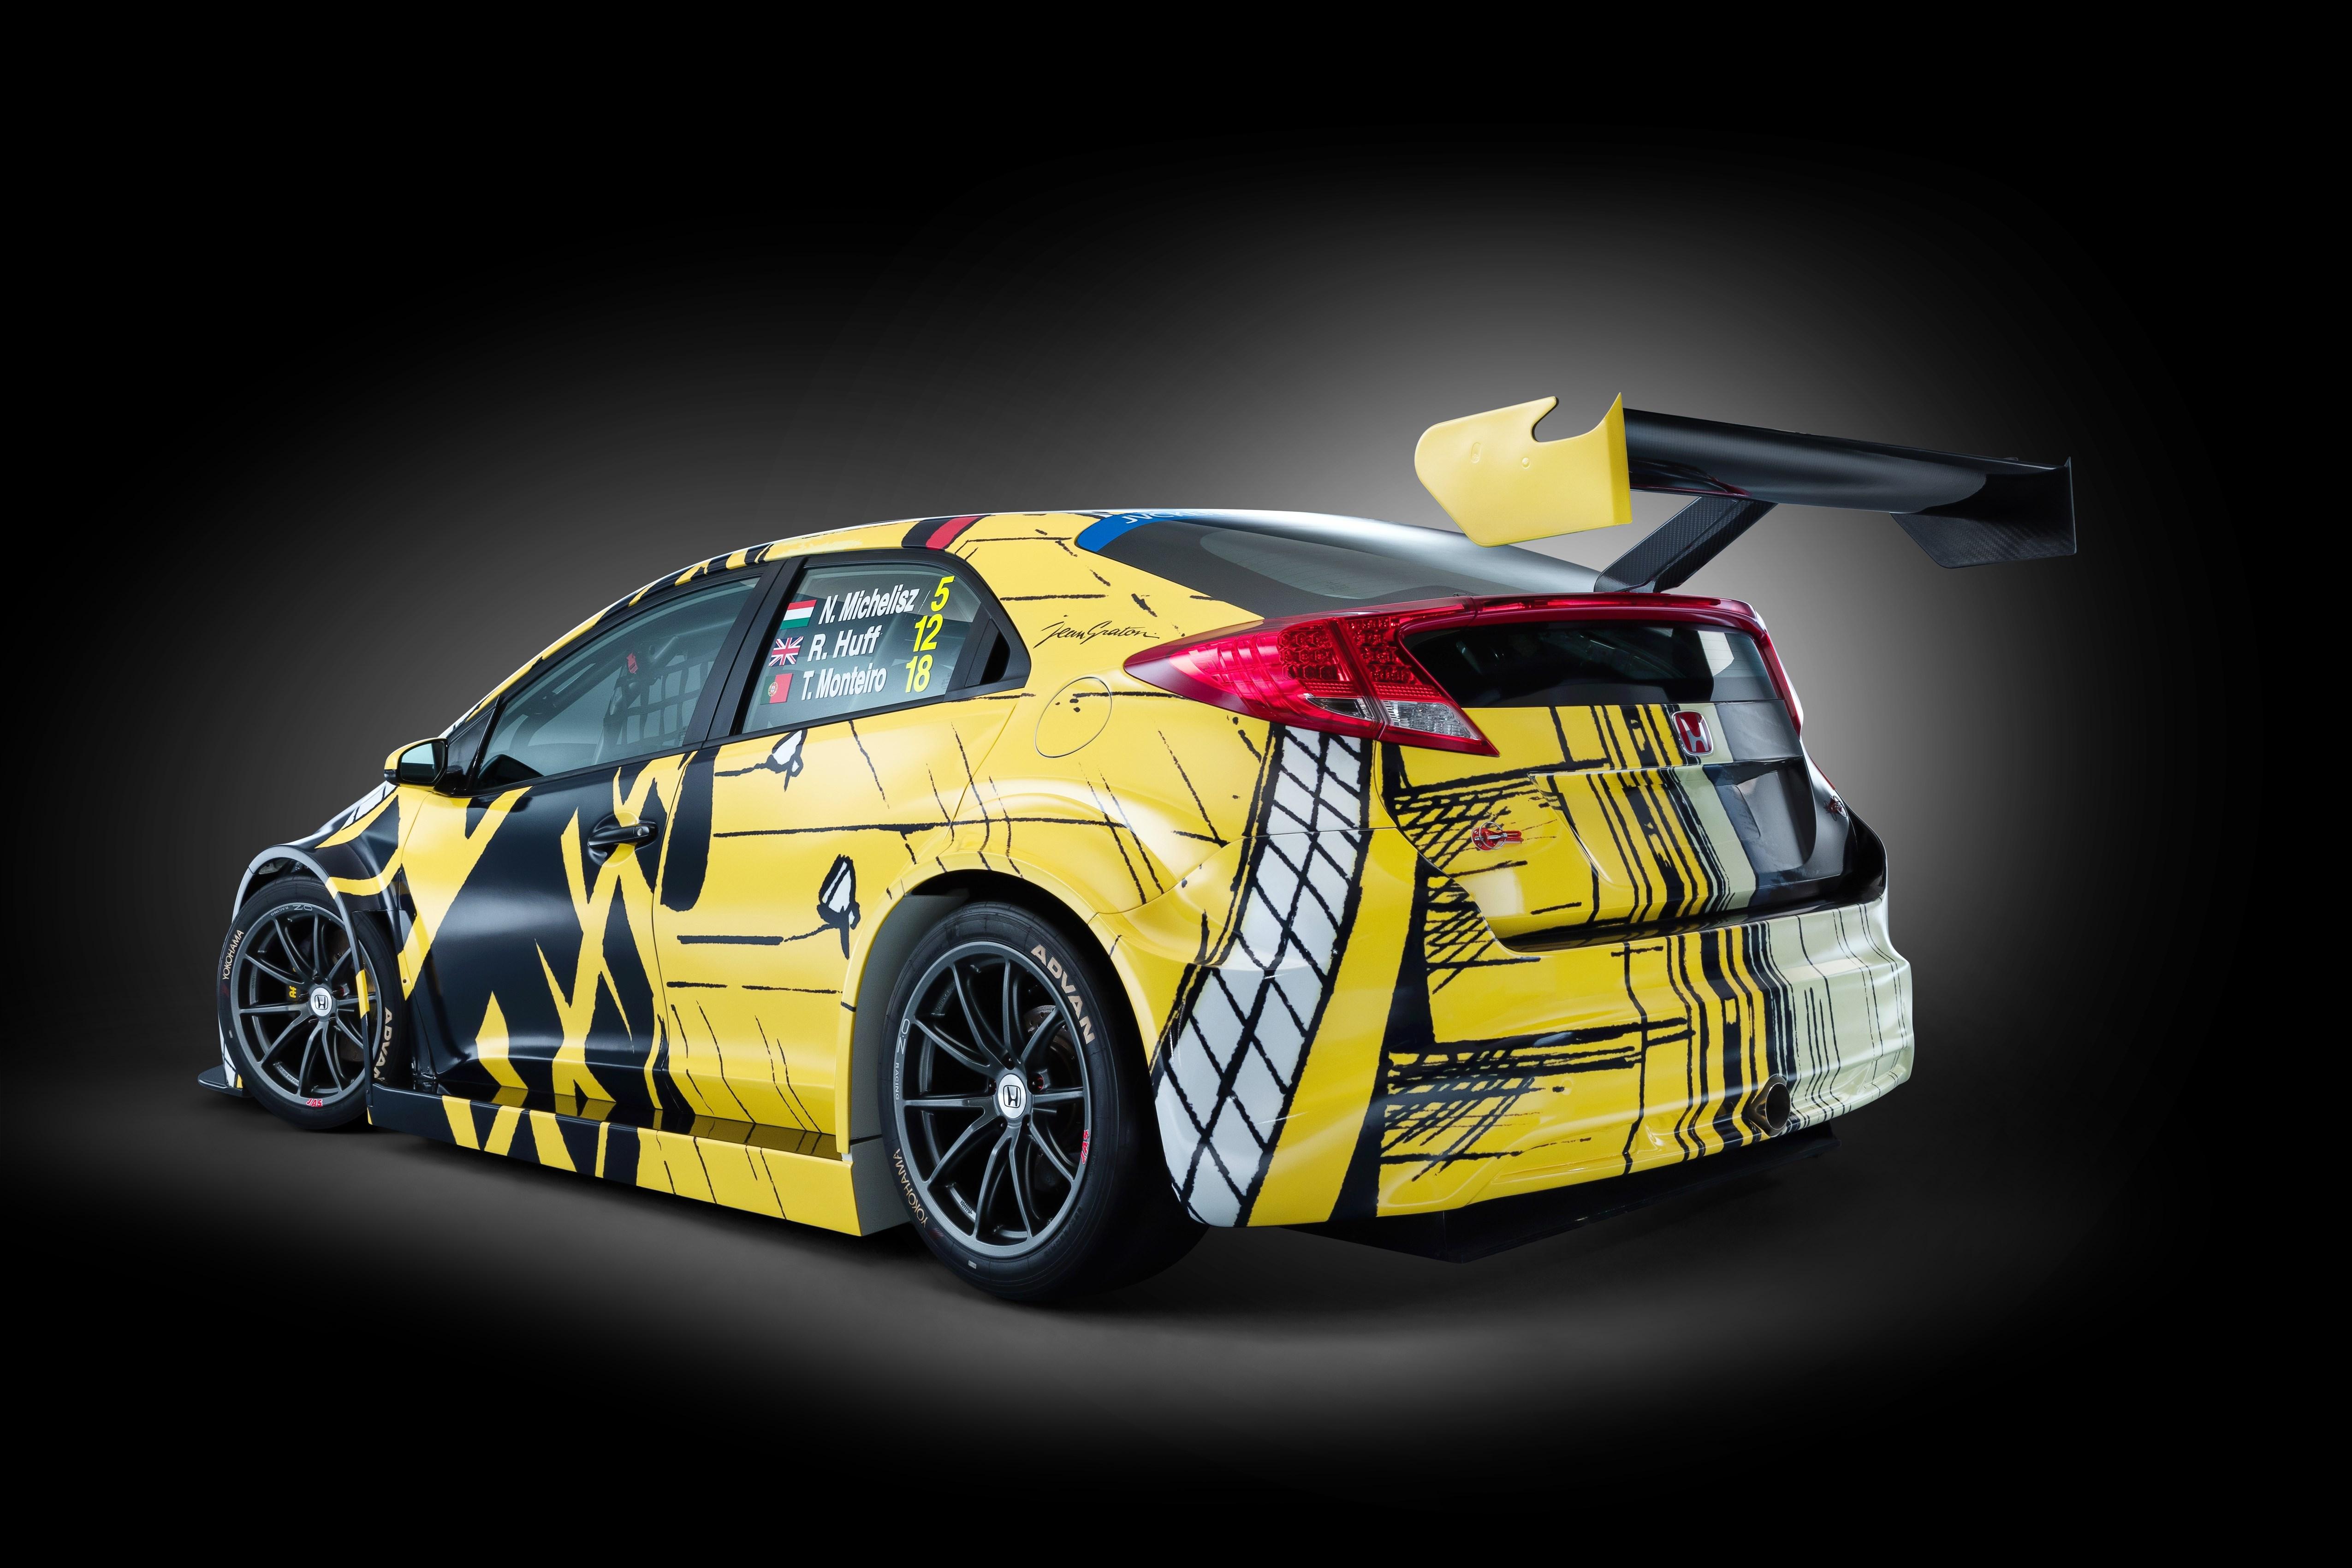 German Car Wallpaper Michel Vaillant Inspired Honda Art Car To Make Race Debut